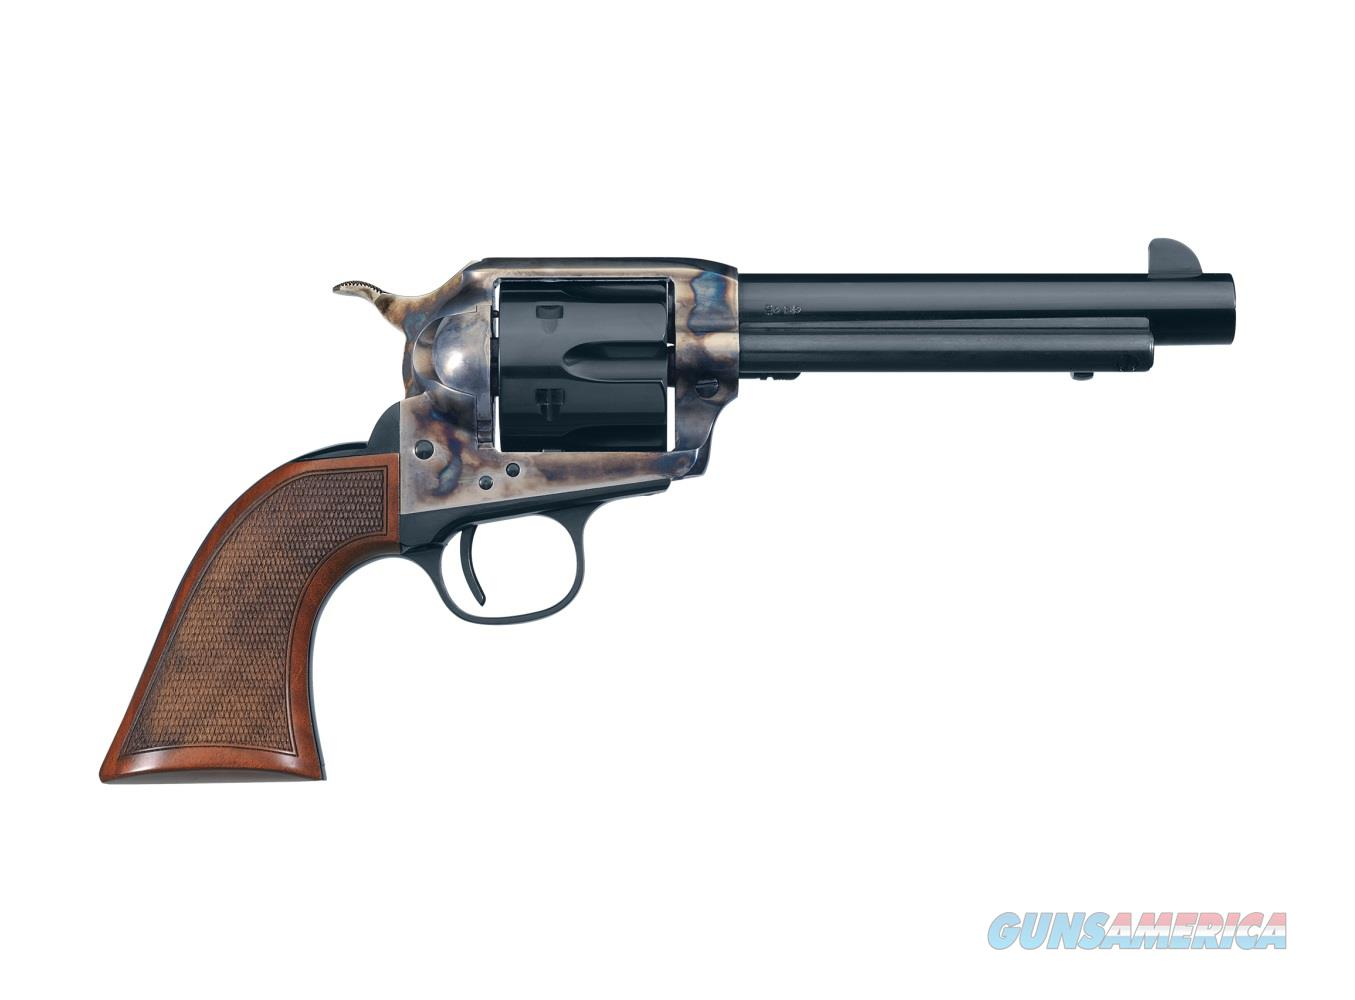 "UBERTI 1873 CATTLEMAN EL PATRON COMPETITION 5.5"" .45 COLT  345181  Guns > Pistols > Uberti Pistols > Ctg."